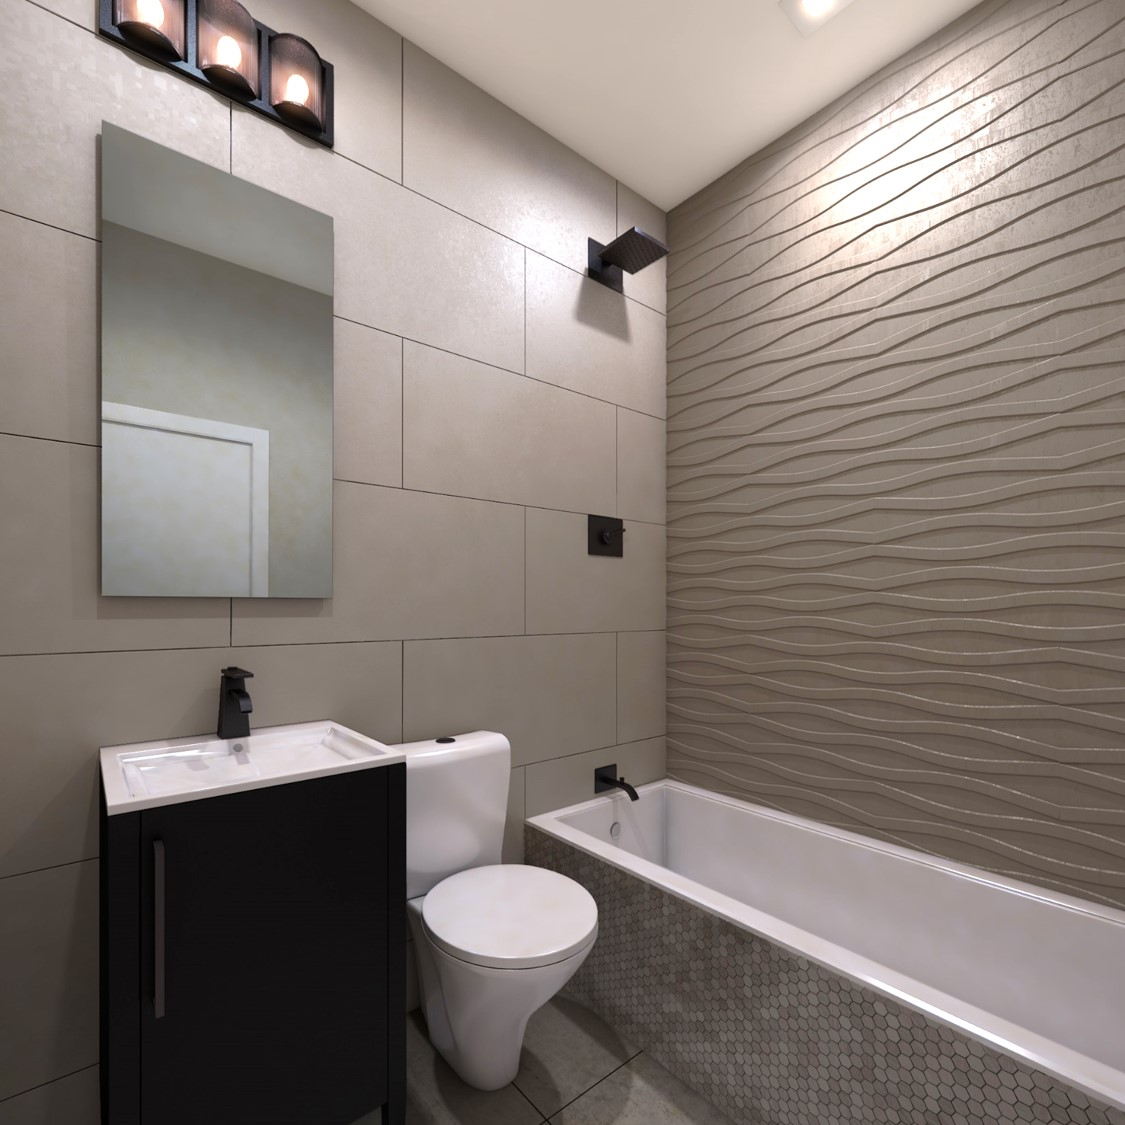 view1 FINAL BATHROOM 12.23.14.jpg